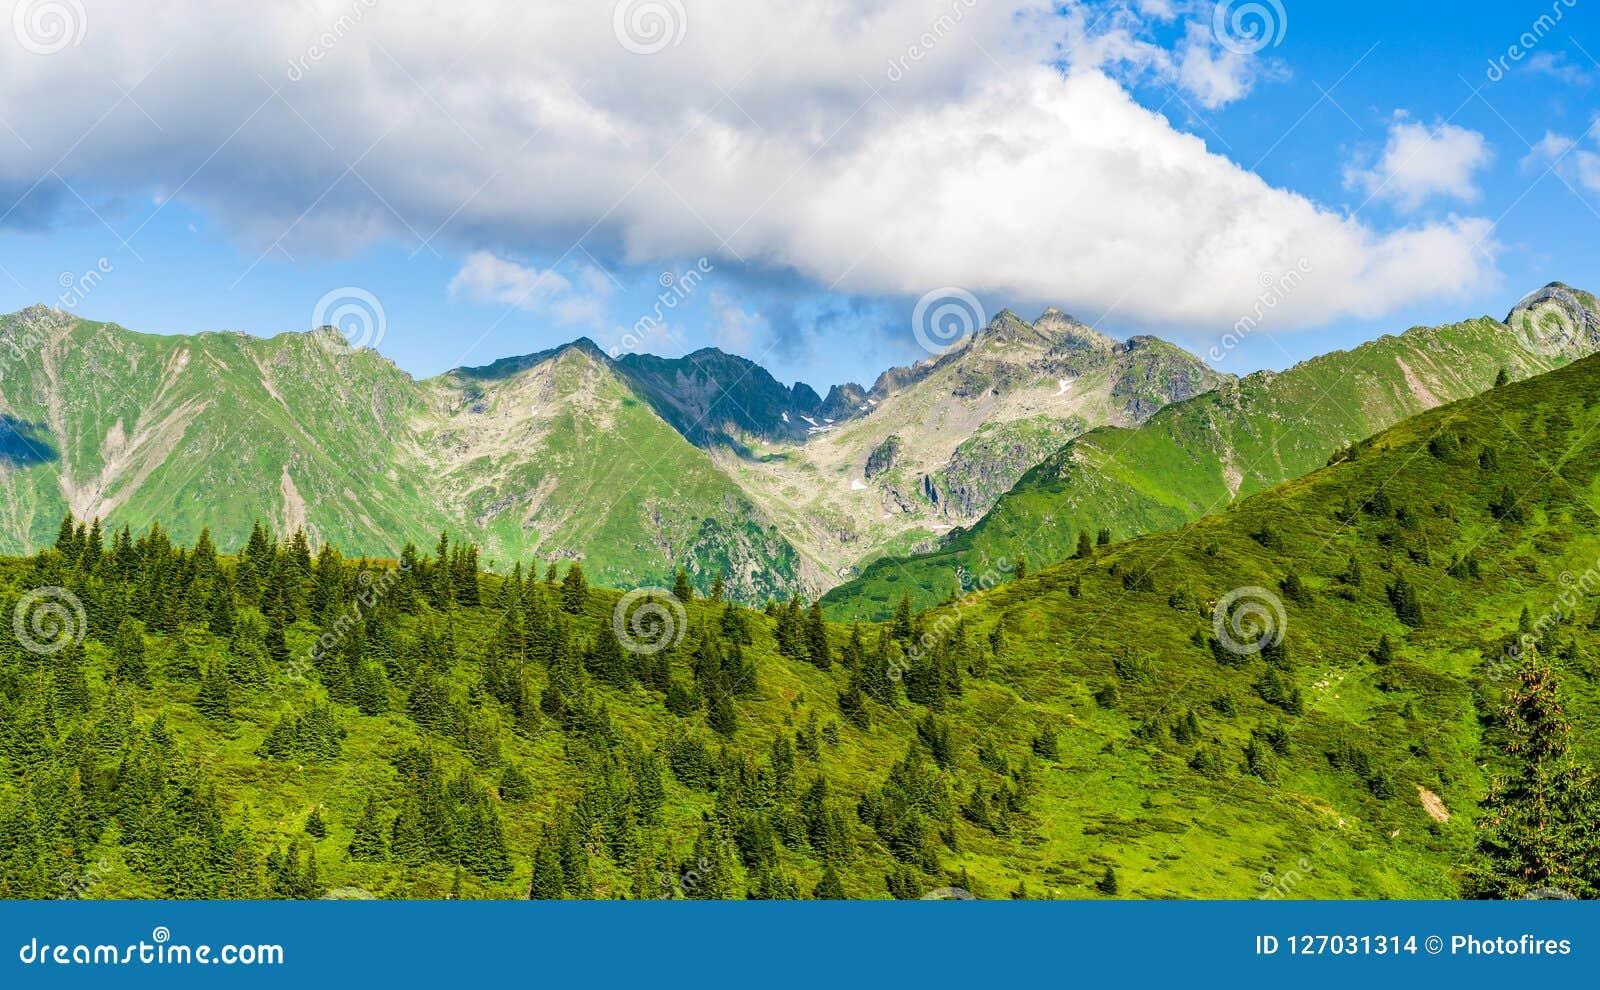 Negoiu Peak at 2535m altitude in Fagaras Carpathians Mountains. Fagaras Mountains, Romania: Panoramic view towards the summit of Negoiu Peak at 2535m altitude Stock Images